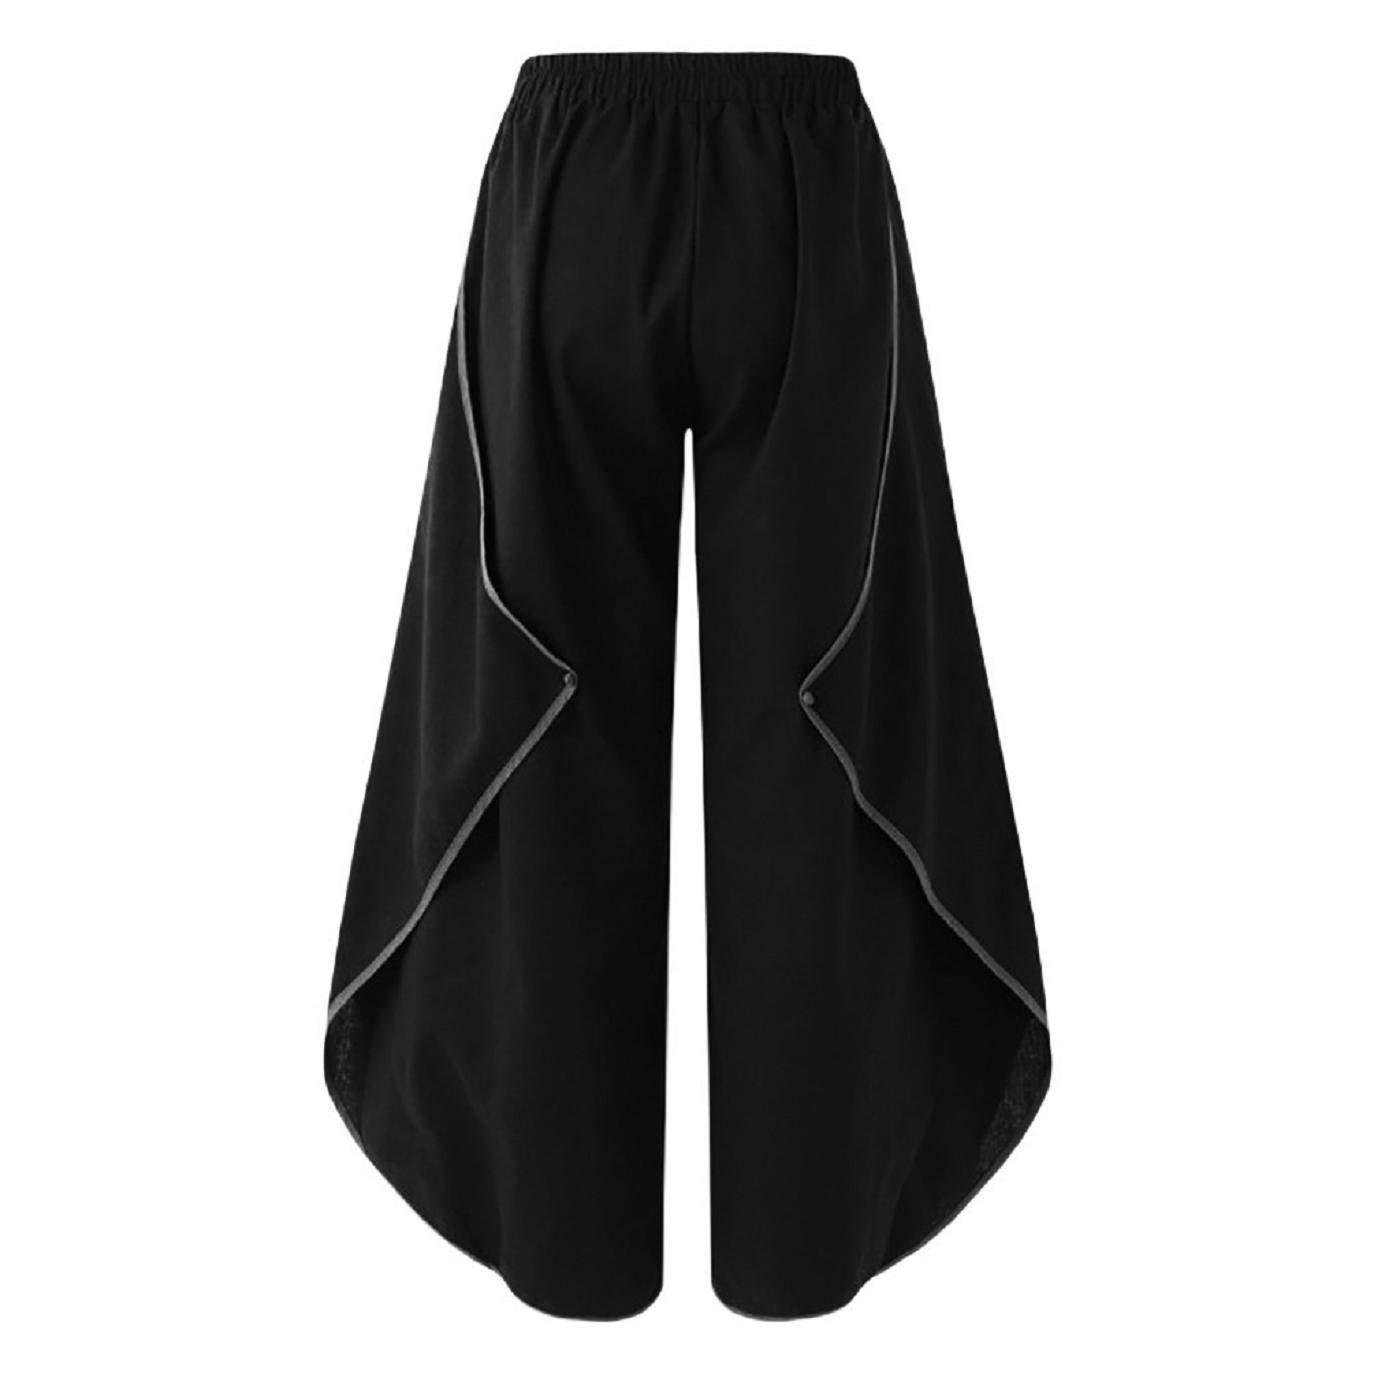 Black L Black L Barlingrock Women Casual Loose Ruffle Wide Leg Pants Sweatpants,Trousers for Work & Casual Wear,Harem Loose Yoga Travel Lounge Festival Beach Pants,Casual Pajama Pants